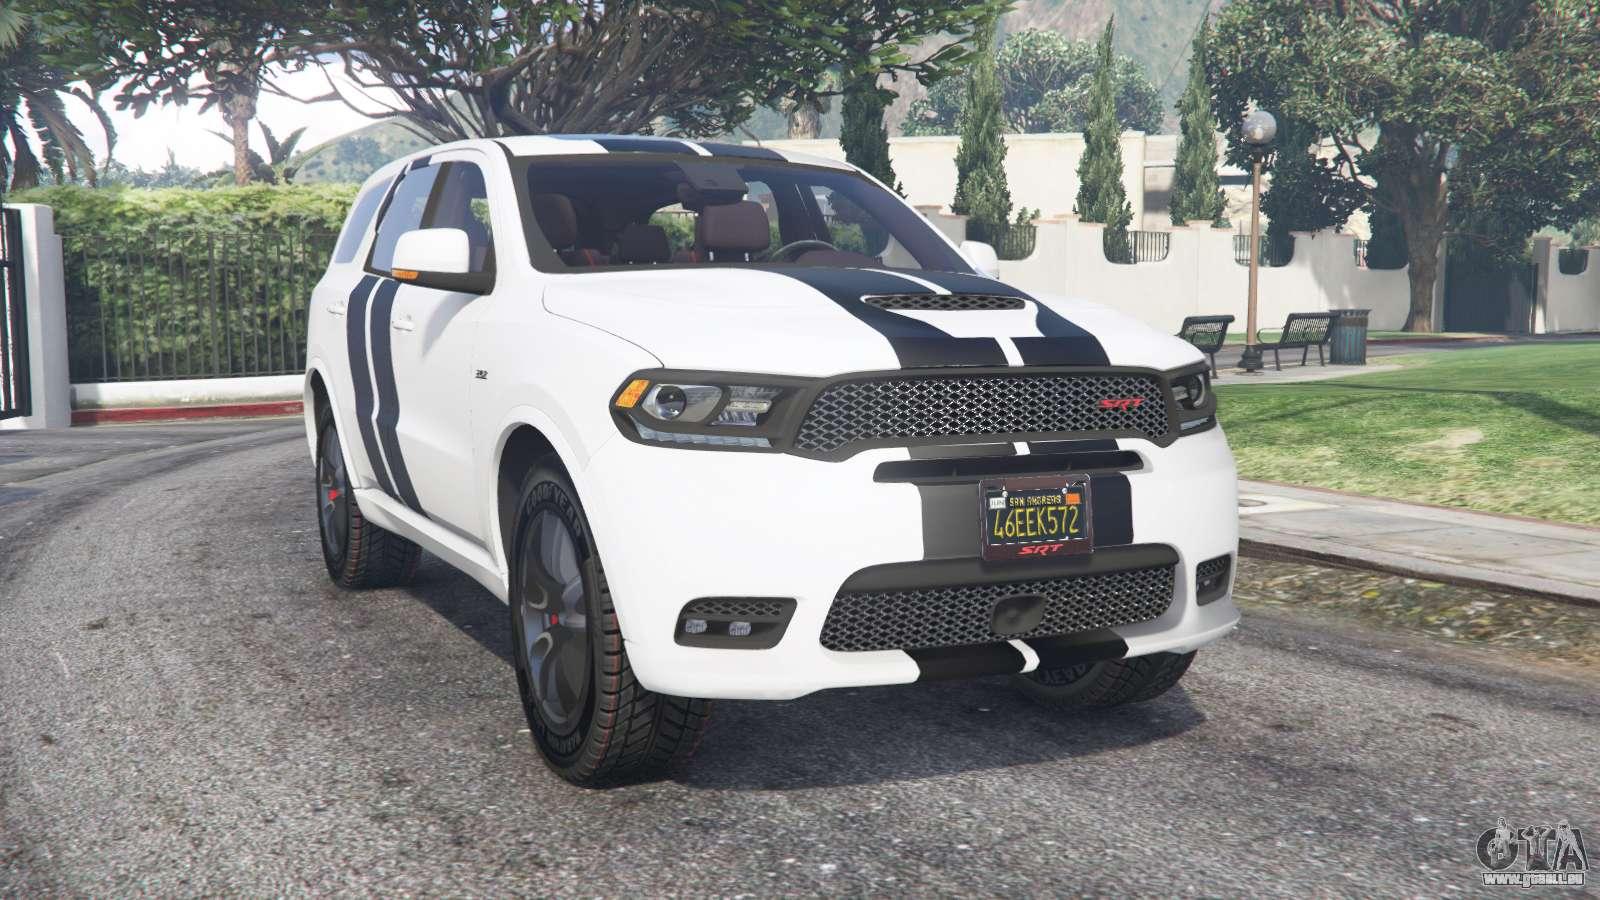 dodge durango srt gta 5 Dodge Durango SRT Mopar 2 v2.2.2 [add-on] für GTA 2